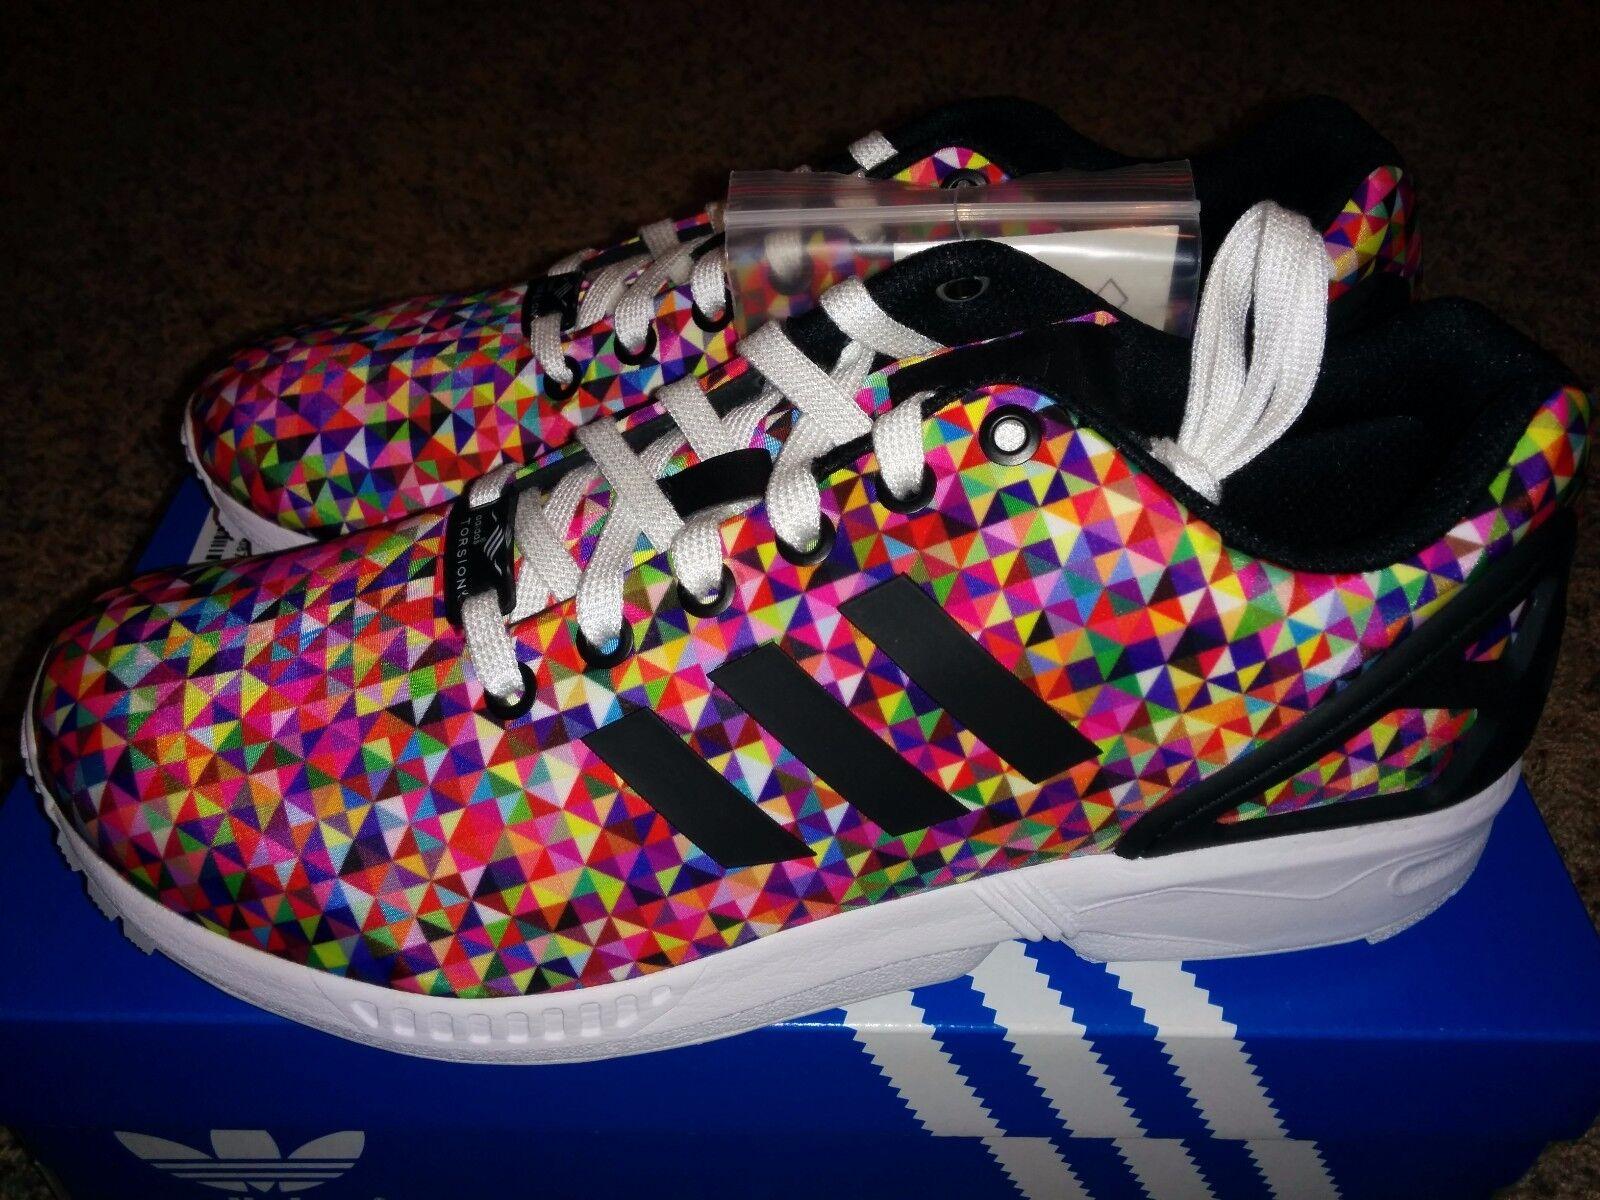 Adidas ZX Flux Multi Color Prism Rainbow Boost Multicolor M19845 Print Xeno NEW Seasonal price cuts, discount benefits